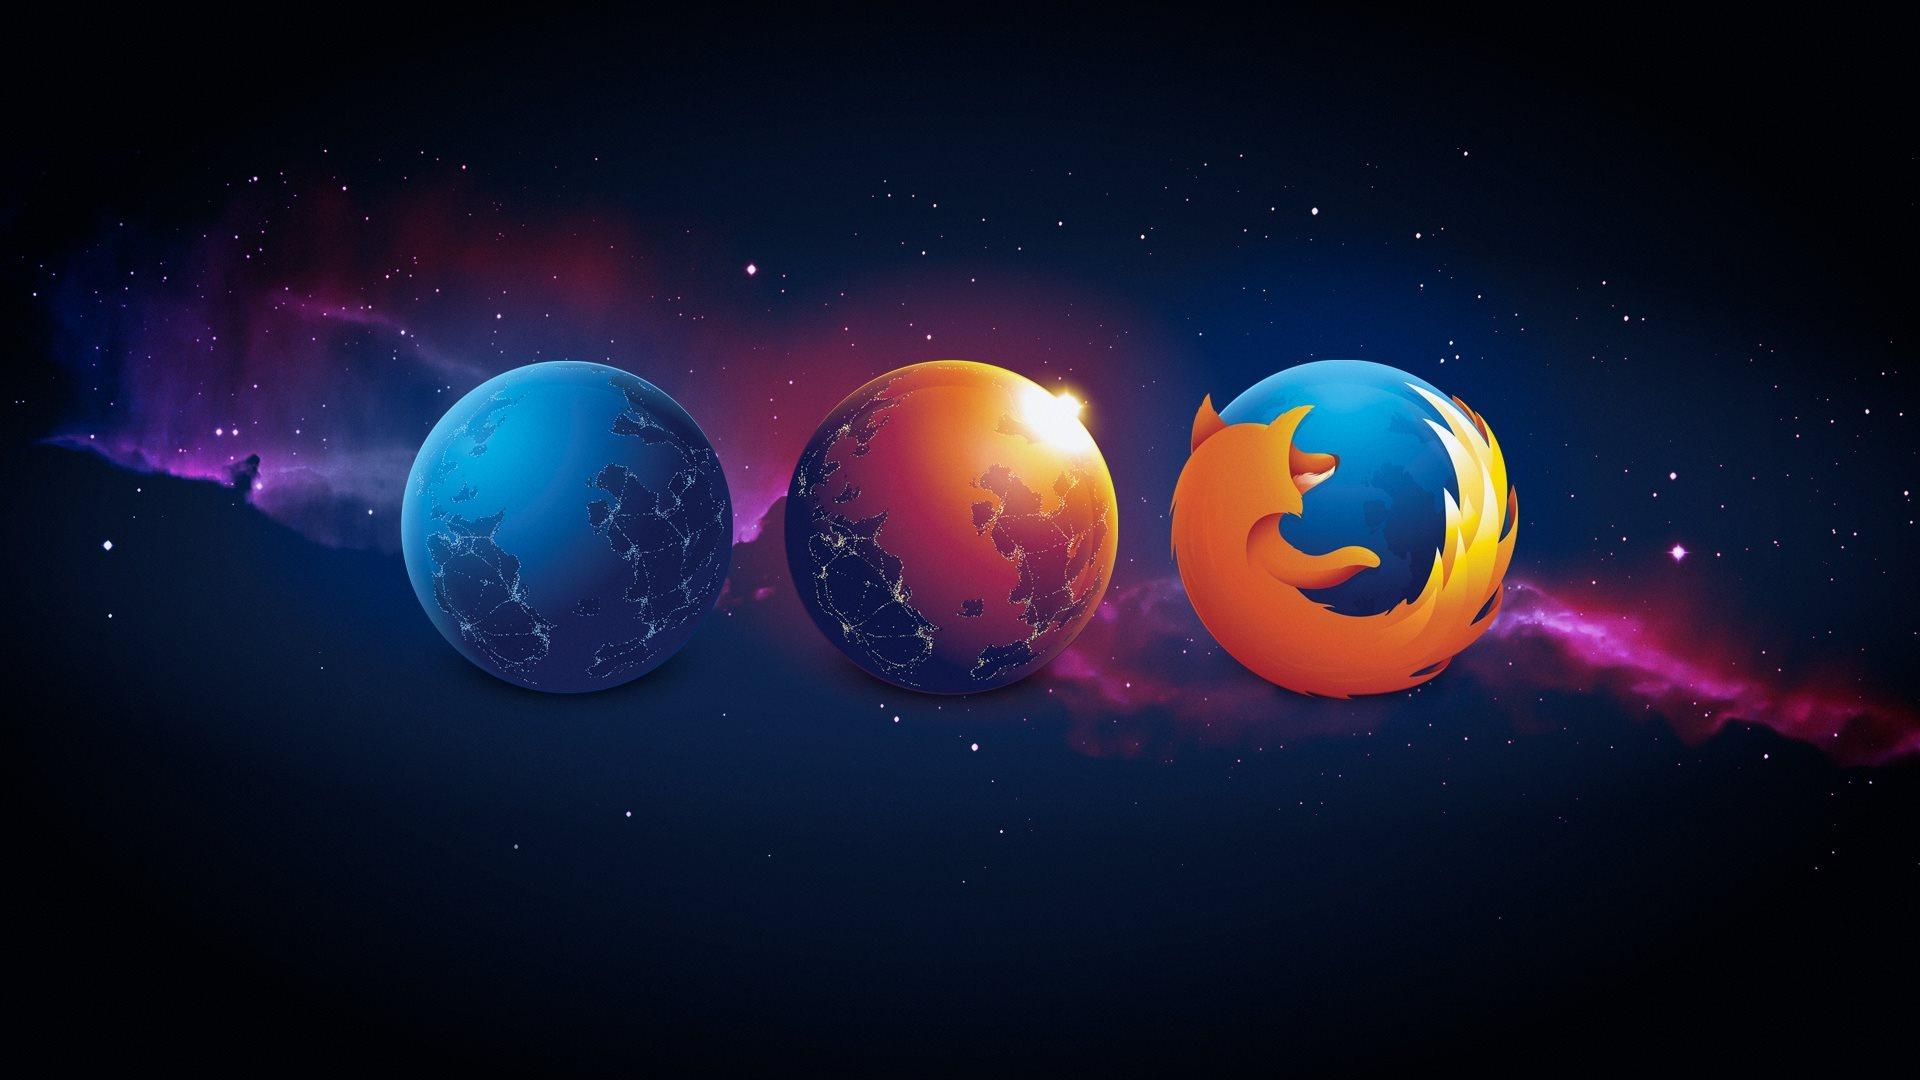 Firefox Logo 1920x1080